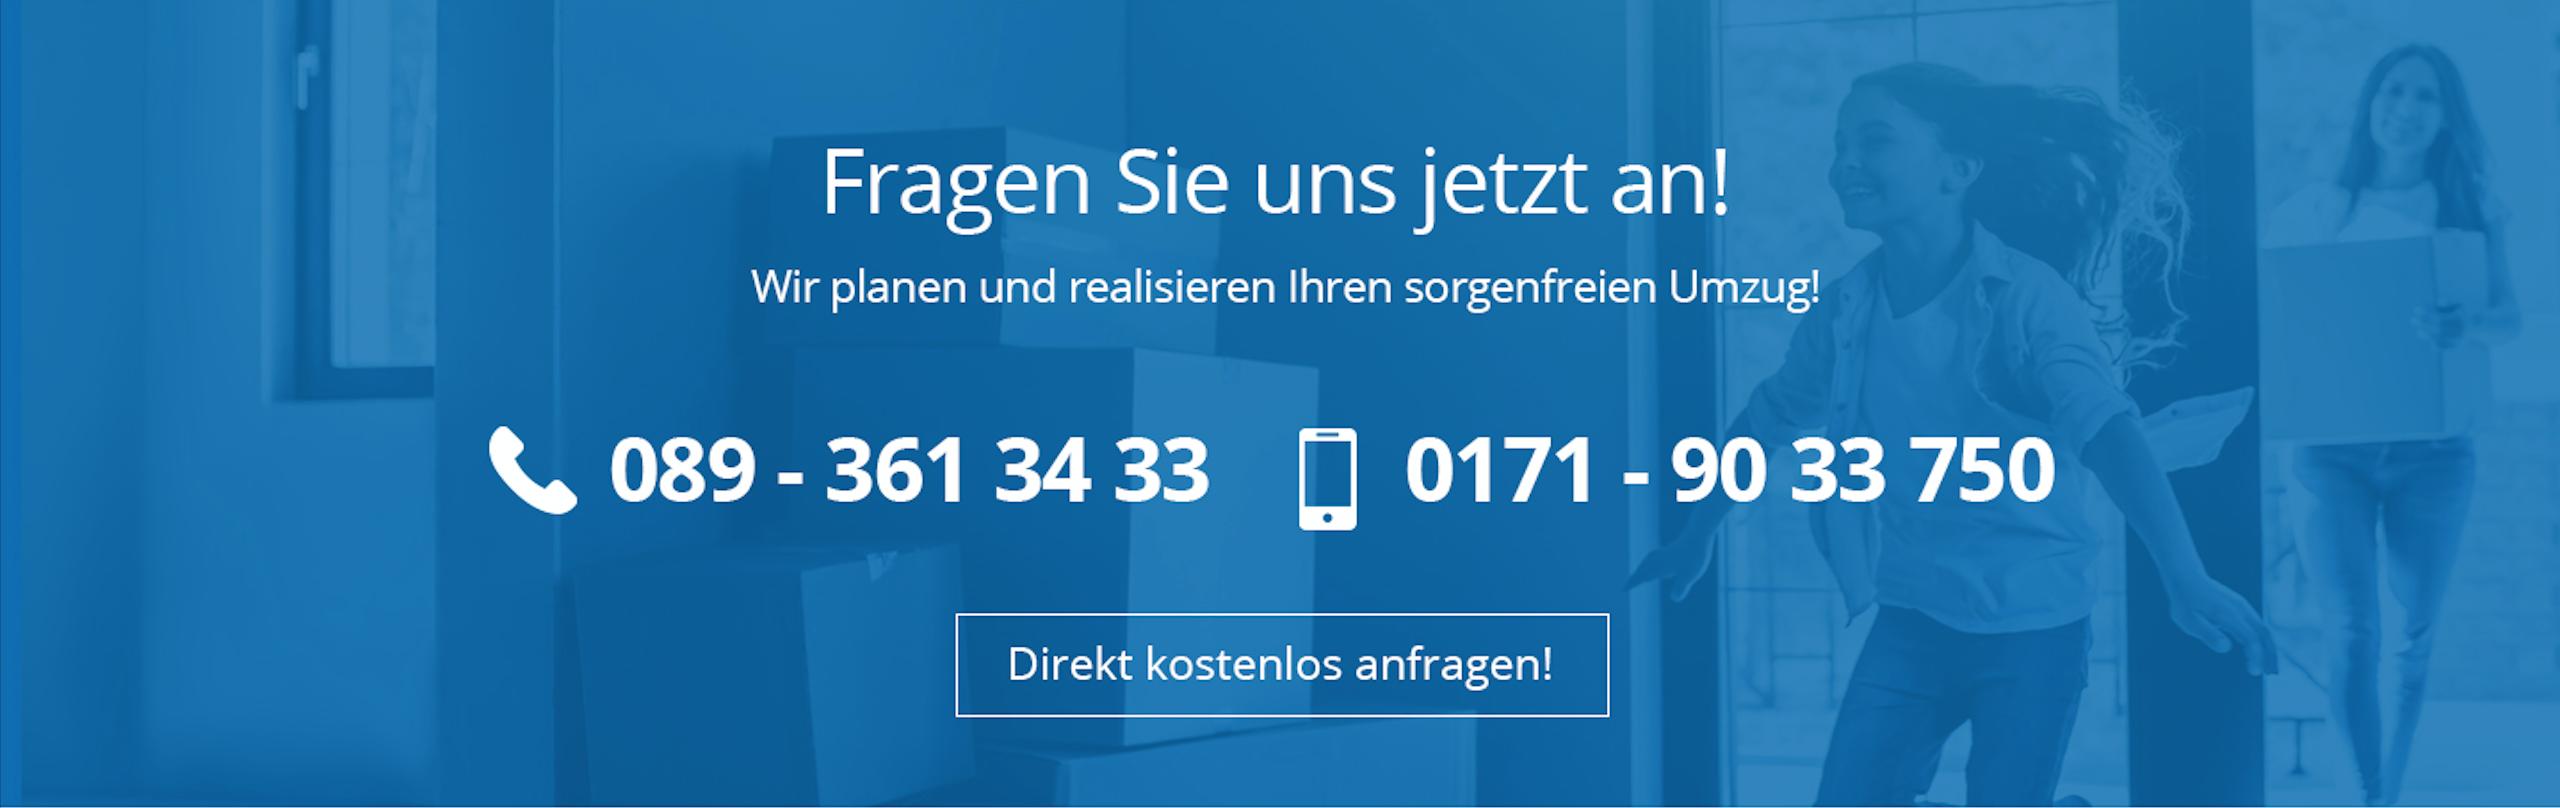 Fragen Sie uns jetzt an info@powerteam-umzuege.de, 089 - 361 34 33